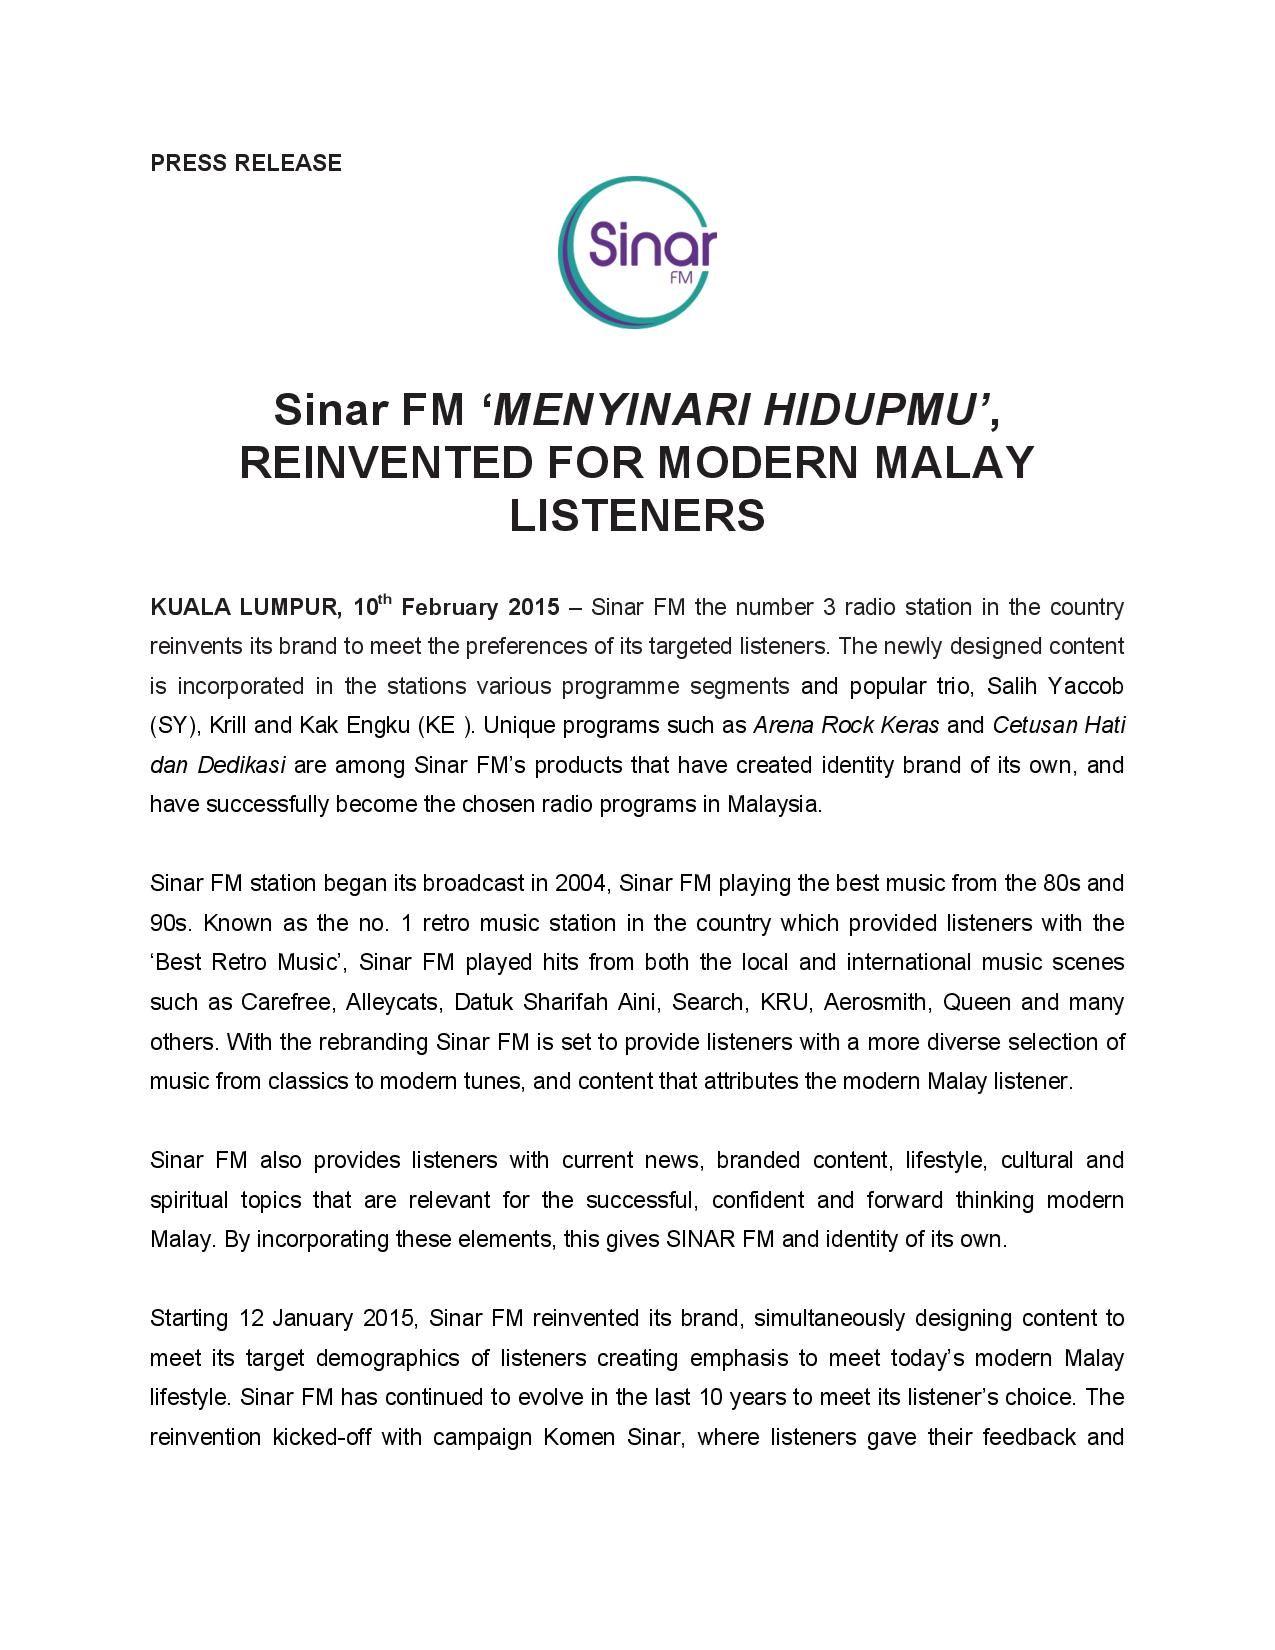 Press Release on Sinar FM's Rebranding